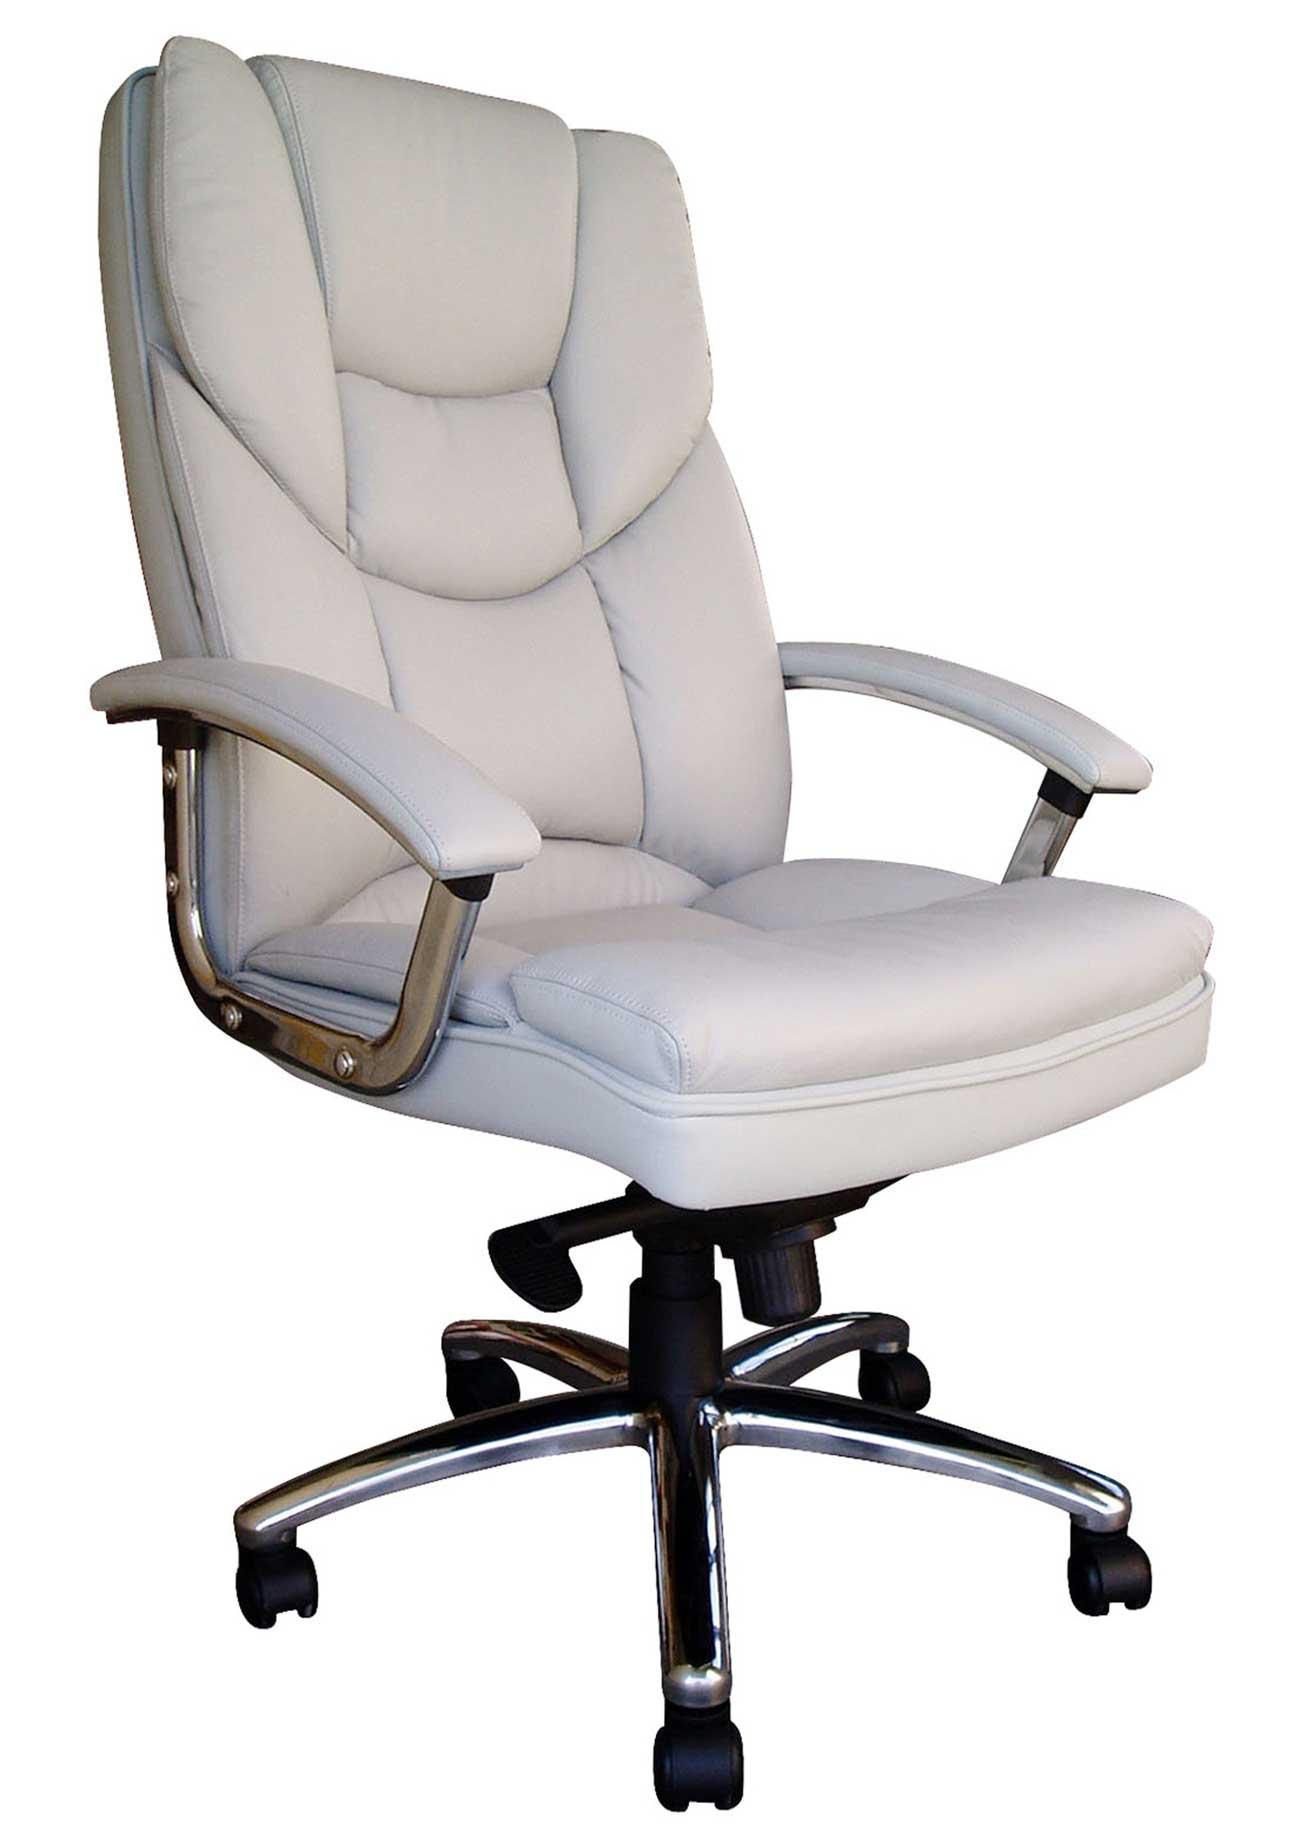 Luxury Office Chair For Elegant Look